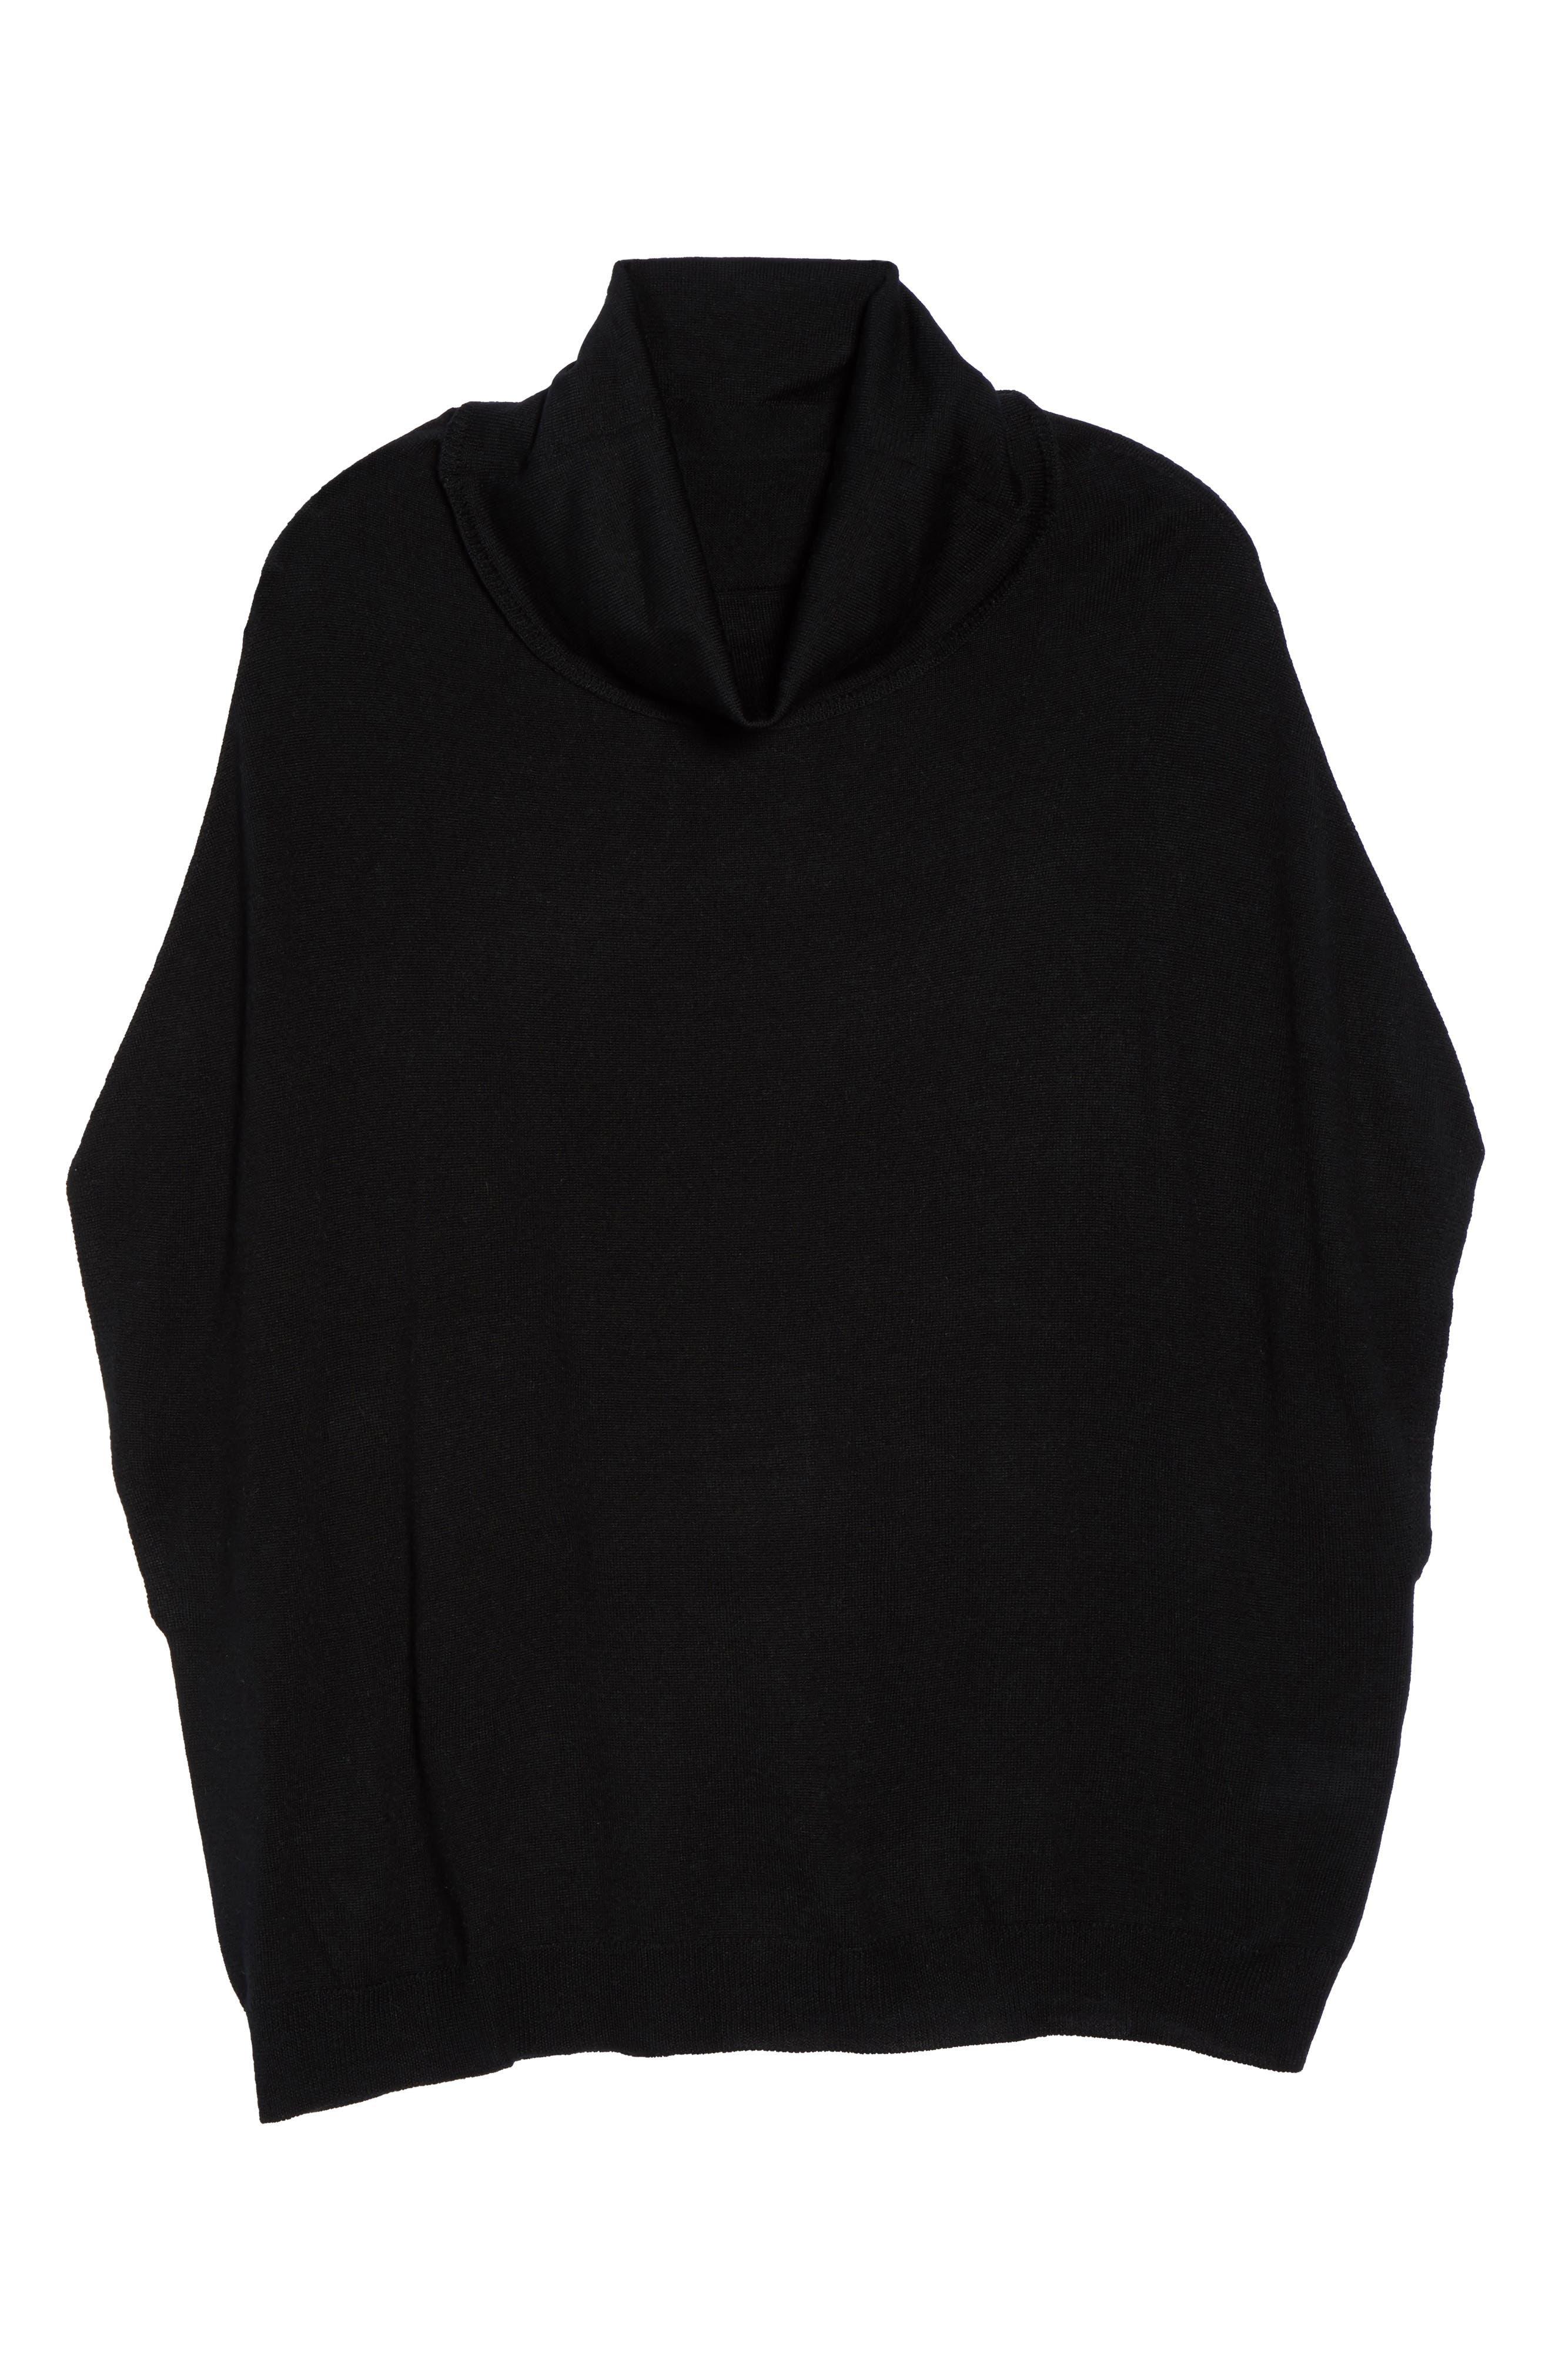 Merino Wool Blend Turtleneck Sweater,                             Alternate thumbnail 6, color,                             001